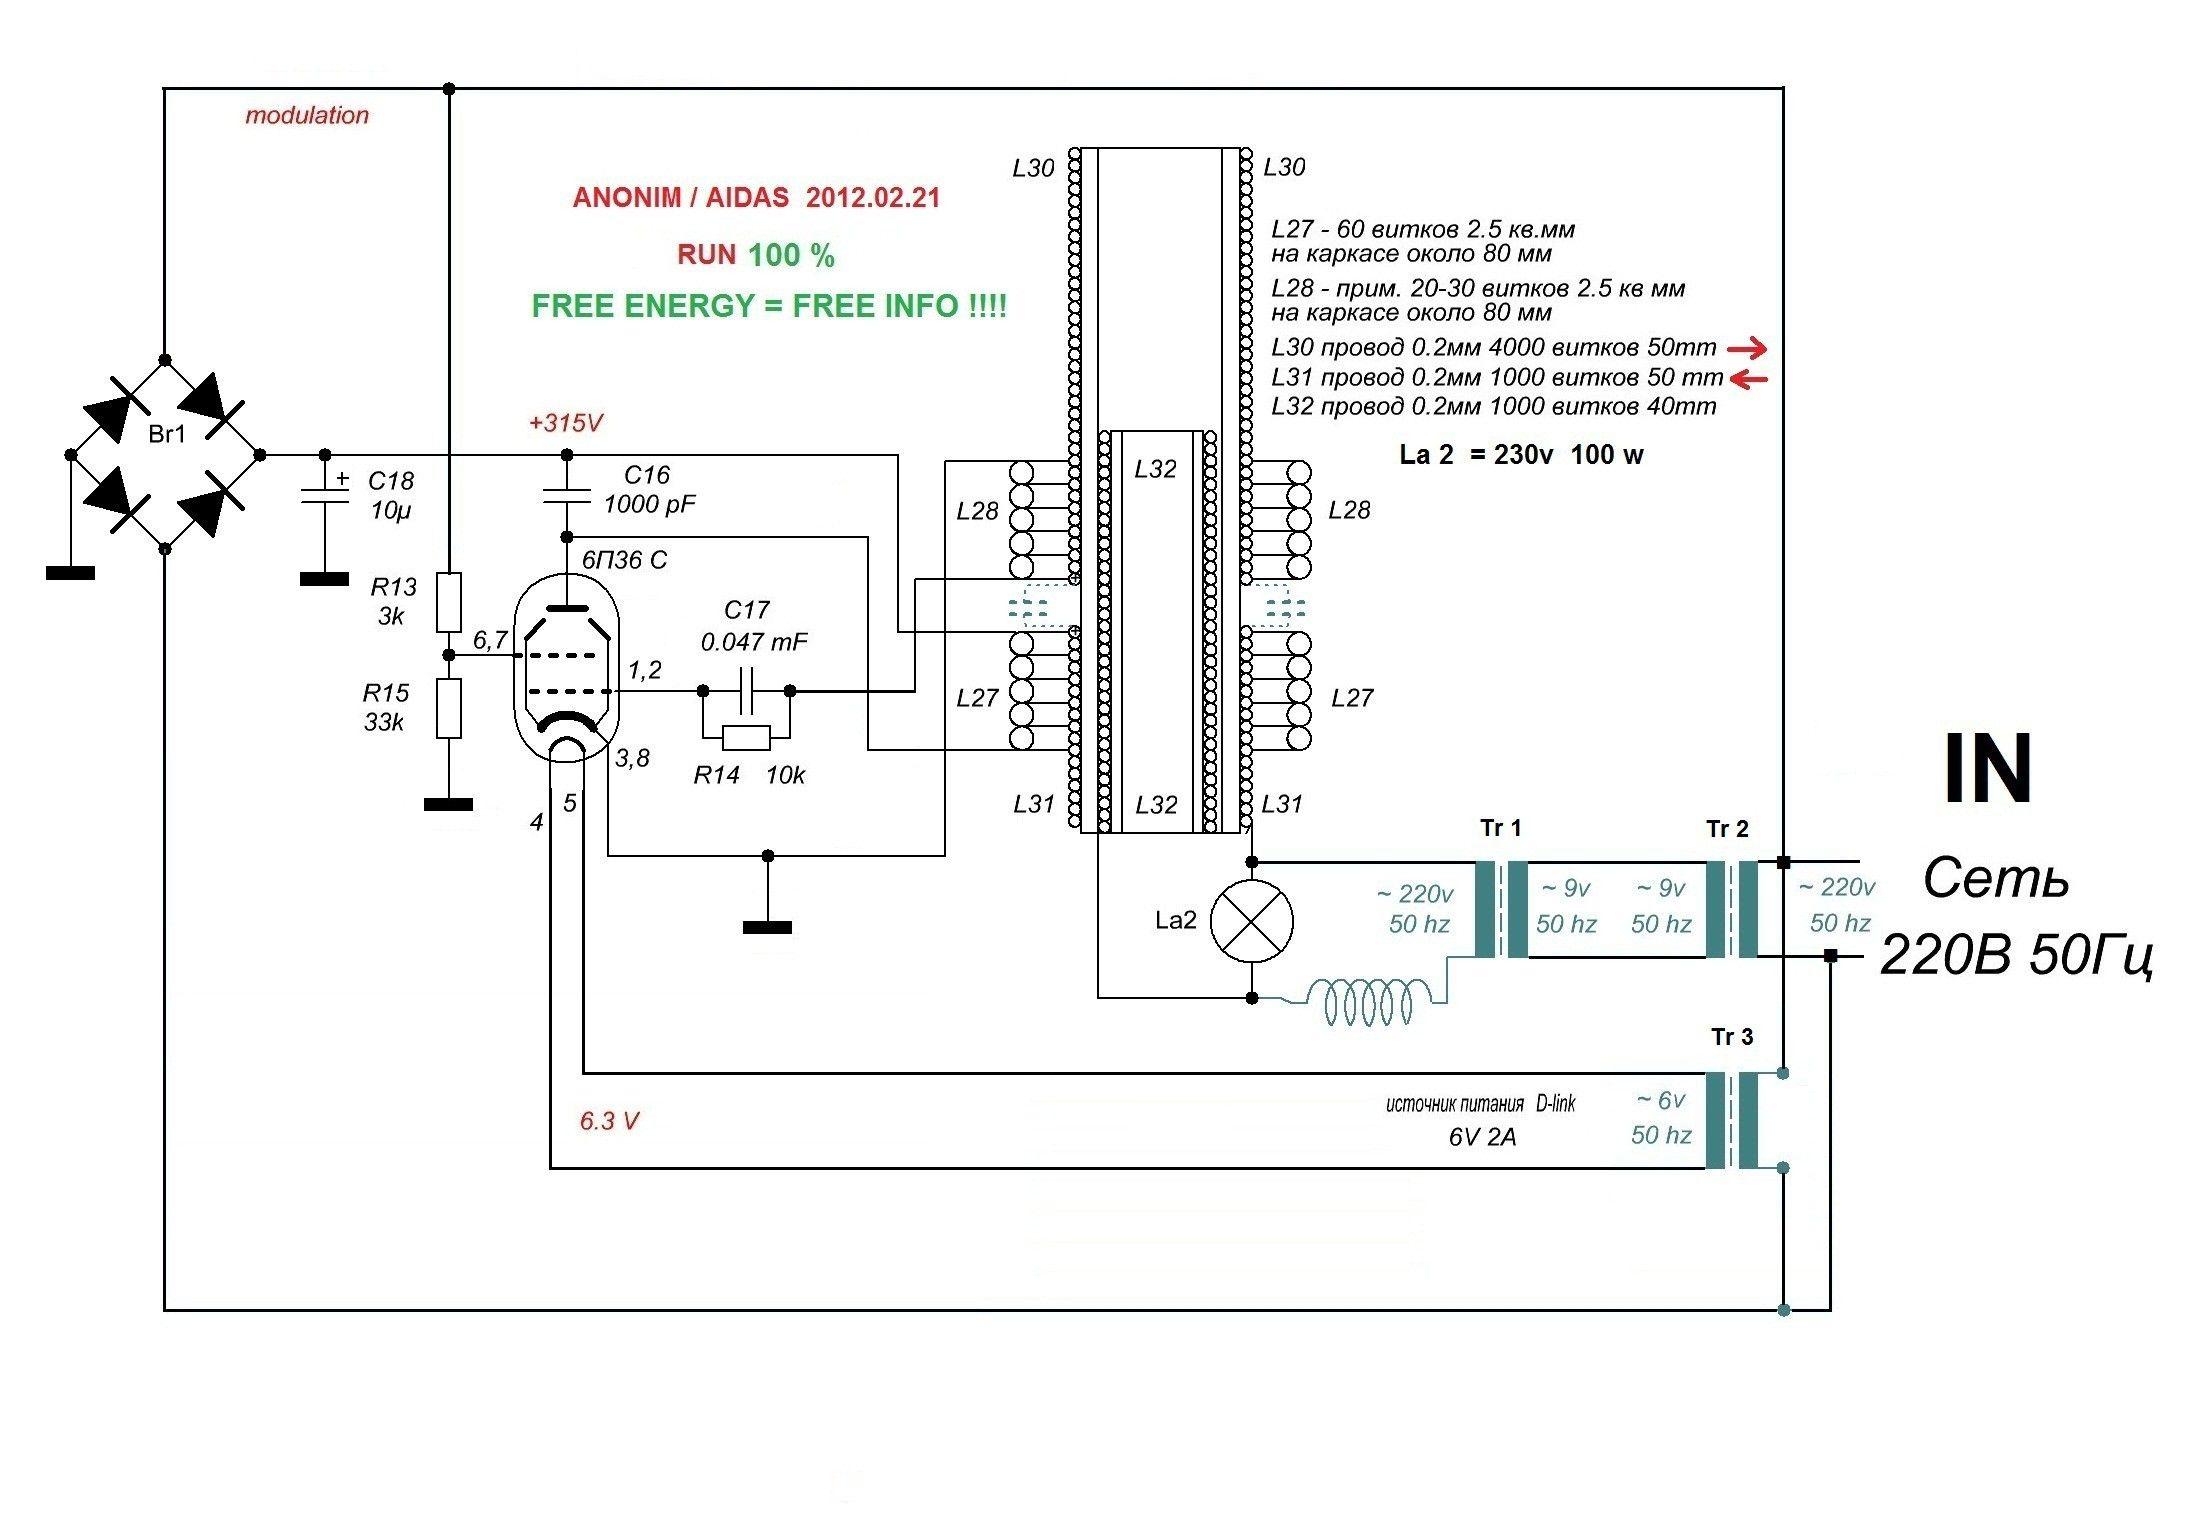 Tesla Coil Wiring Diagram Schematics Circuit Luxo Re Selfrunning Dispositivos De 9v